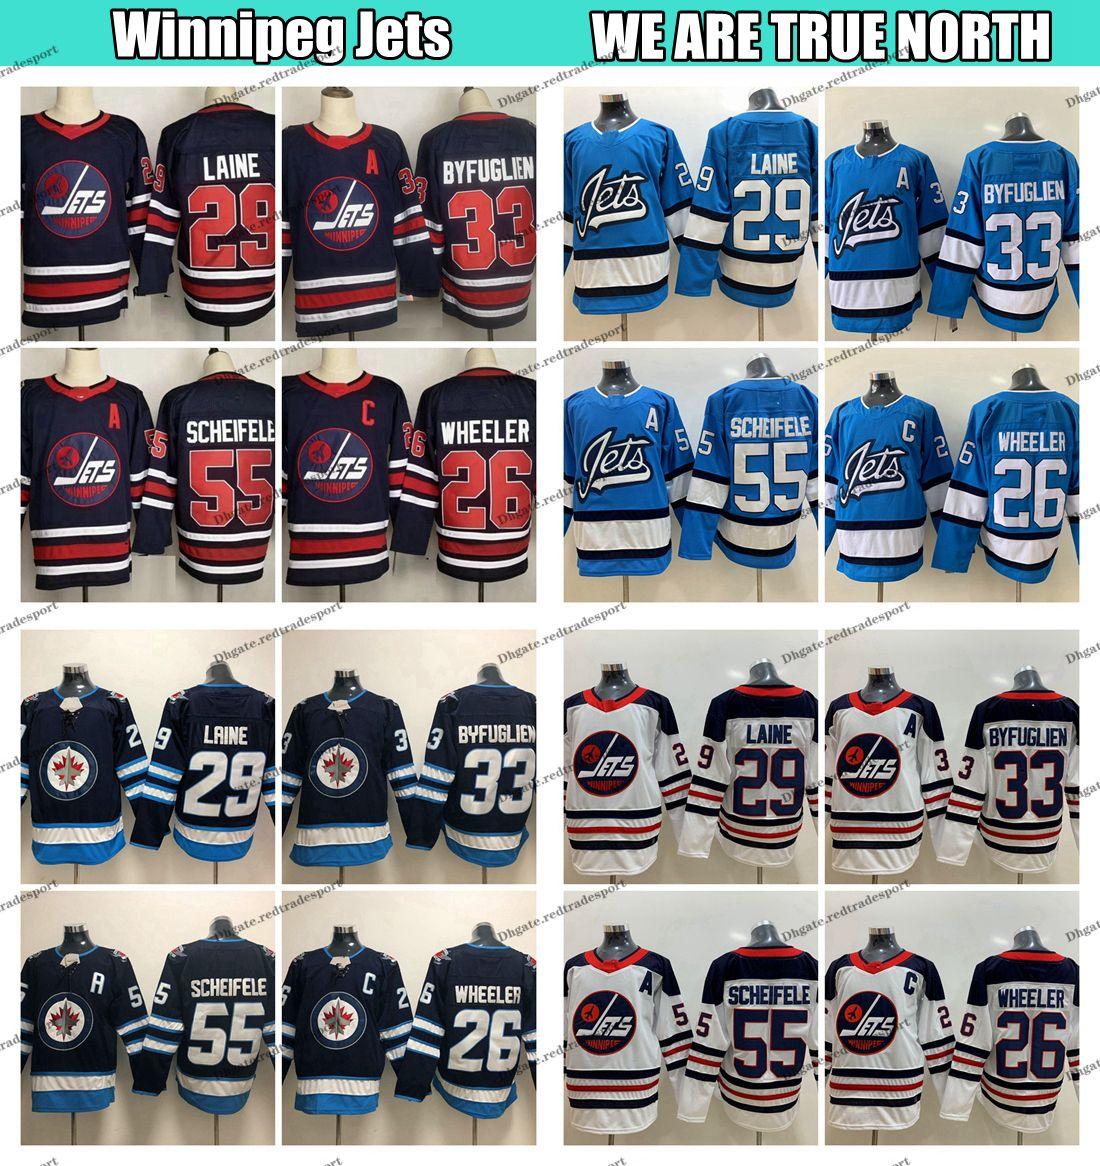 2019 Heritage Classic Winnipeg Jets 29 Patrik Laine 55 Marcos 26 Scheifele Blake Wheeler 33 Dustin Armada BYFUGLIEN blanca jerseys del hockey